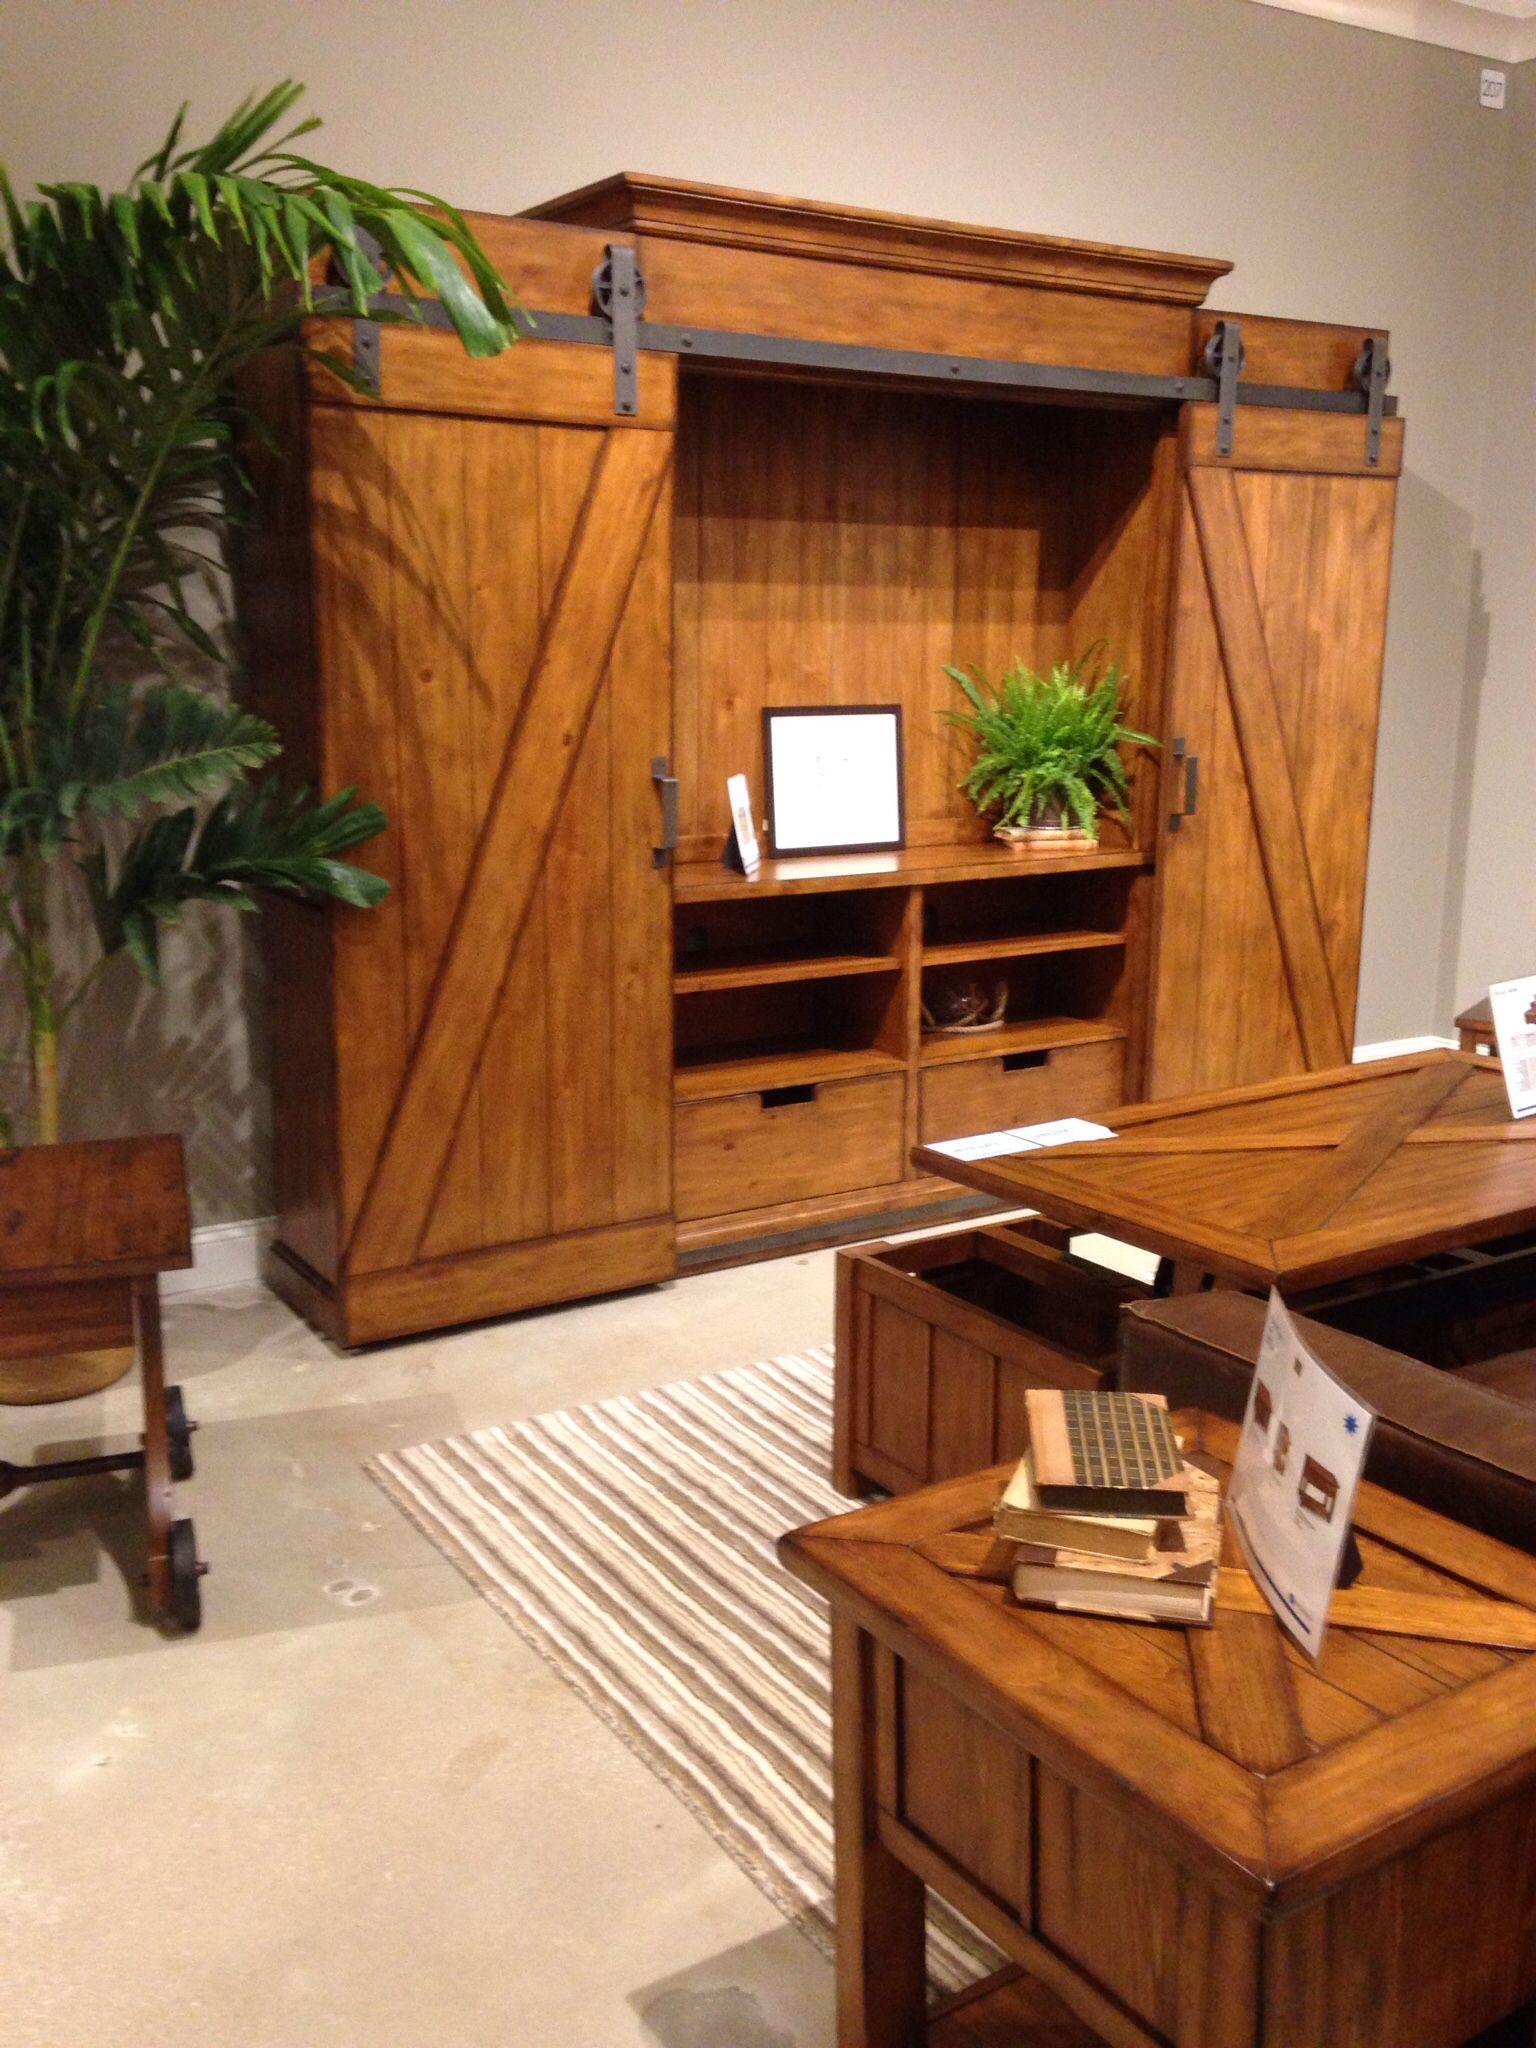 Entertainment Indian River Furniture Rockledge Florida Credenza Armoire Tack